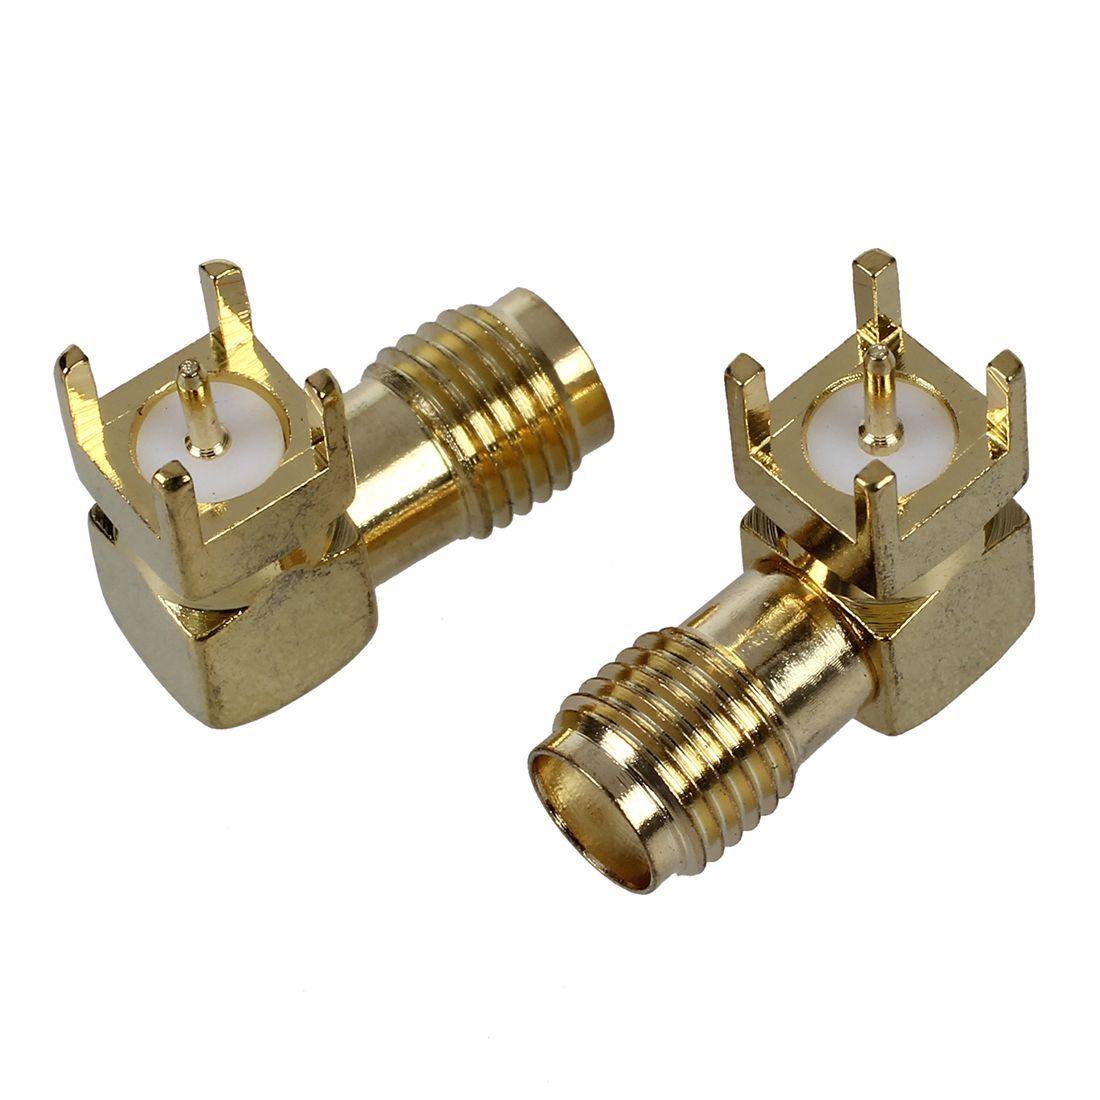 2 Pcs Sma Female Jack Panel Mount Pcb Solder Connectors Gold Tone Connectors Ebay